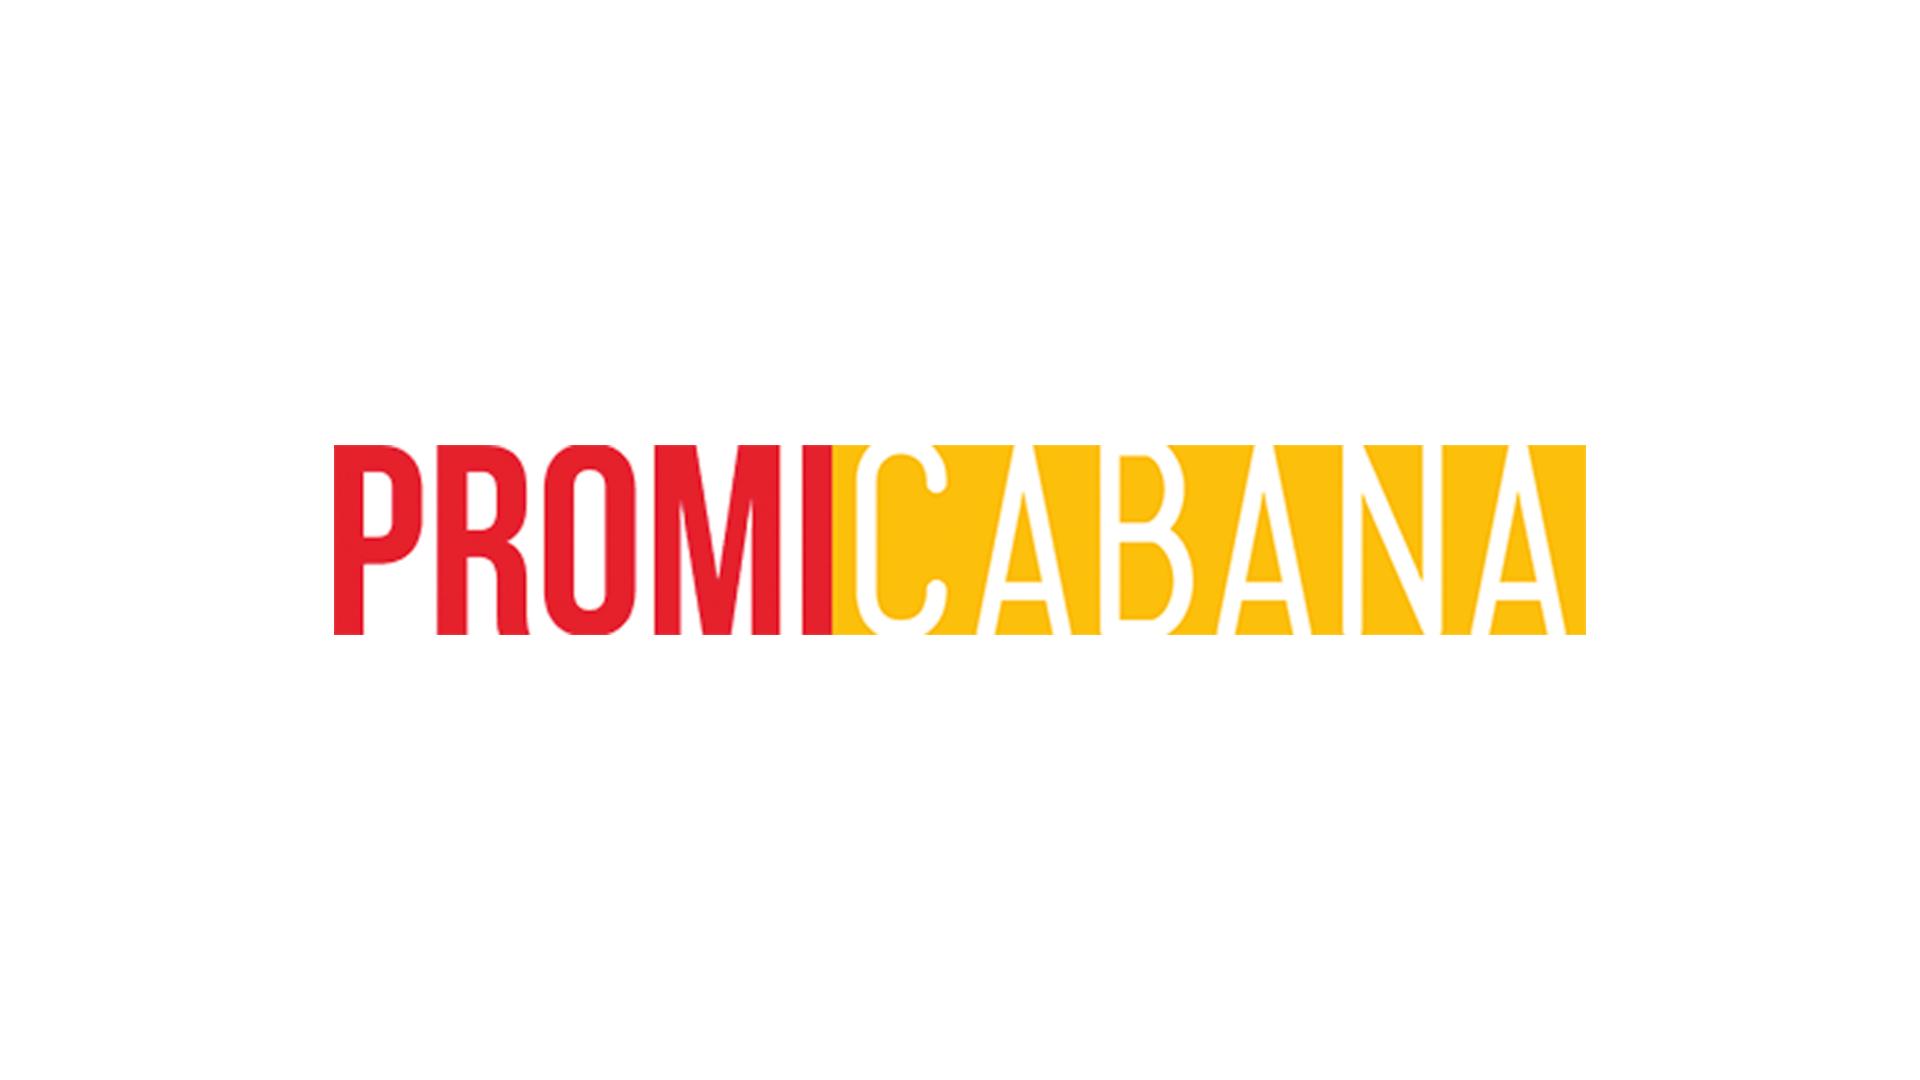 Clive-Davis-Pre-Grammy-2013-Miley-Cyrus-Katy-Perry-Hohn-Mayer